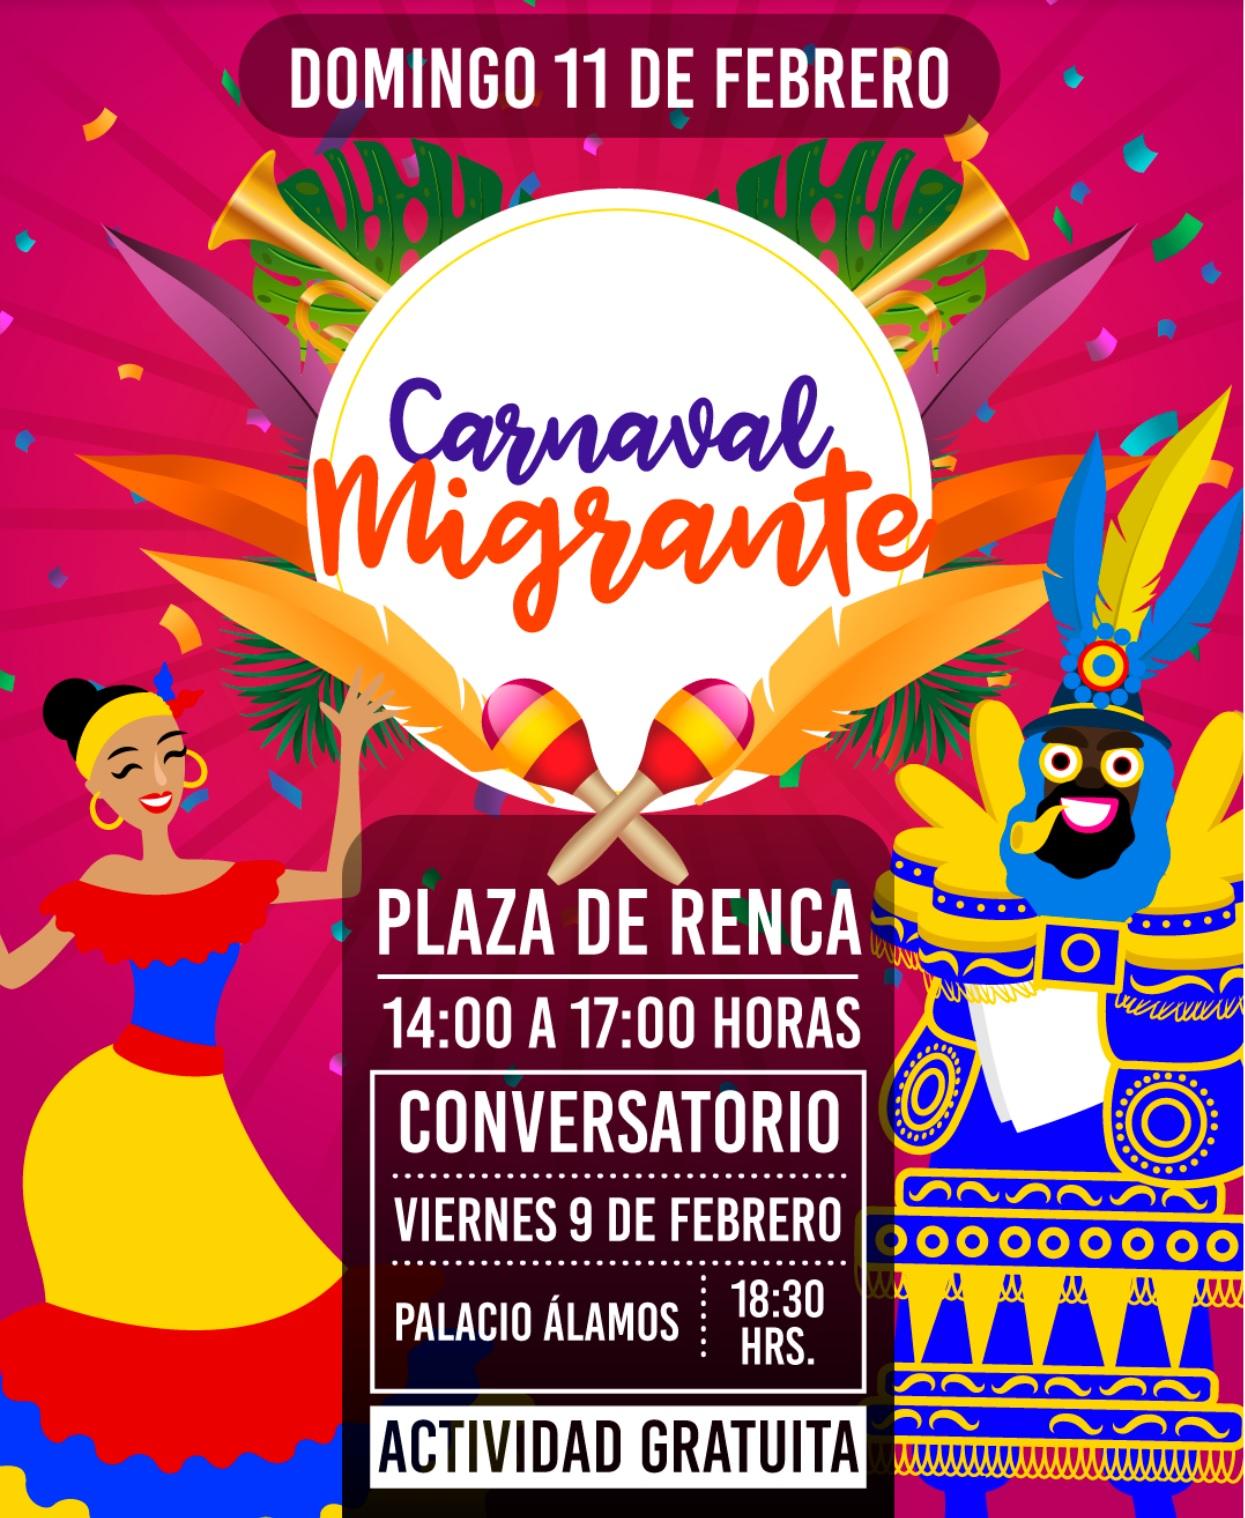 Carnaval Latinoamérica Migrante